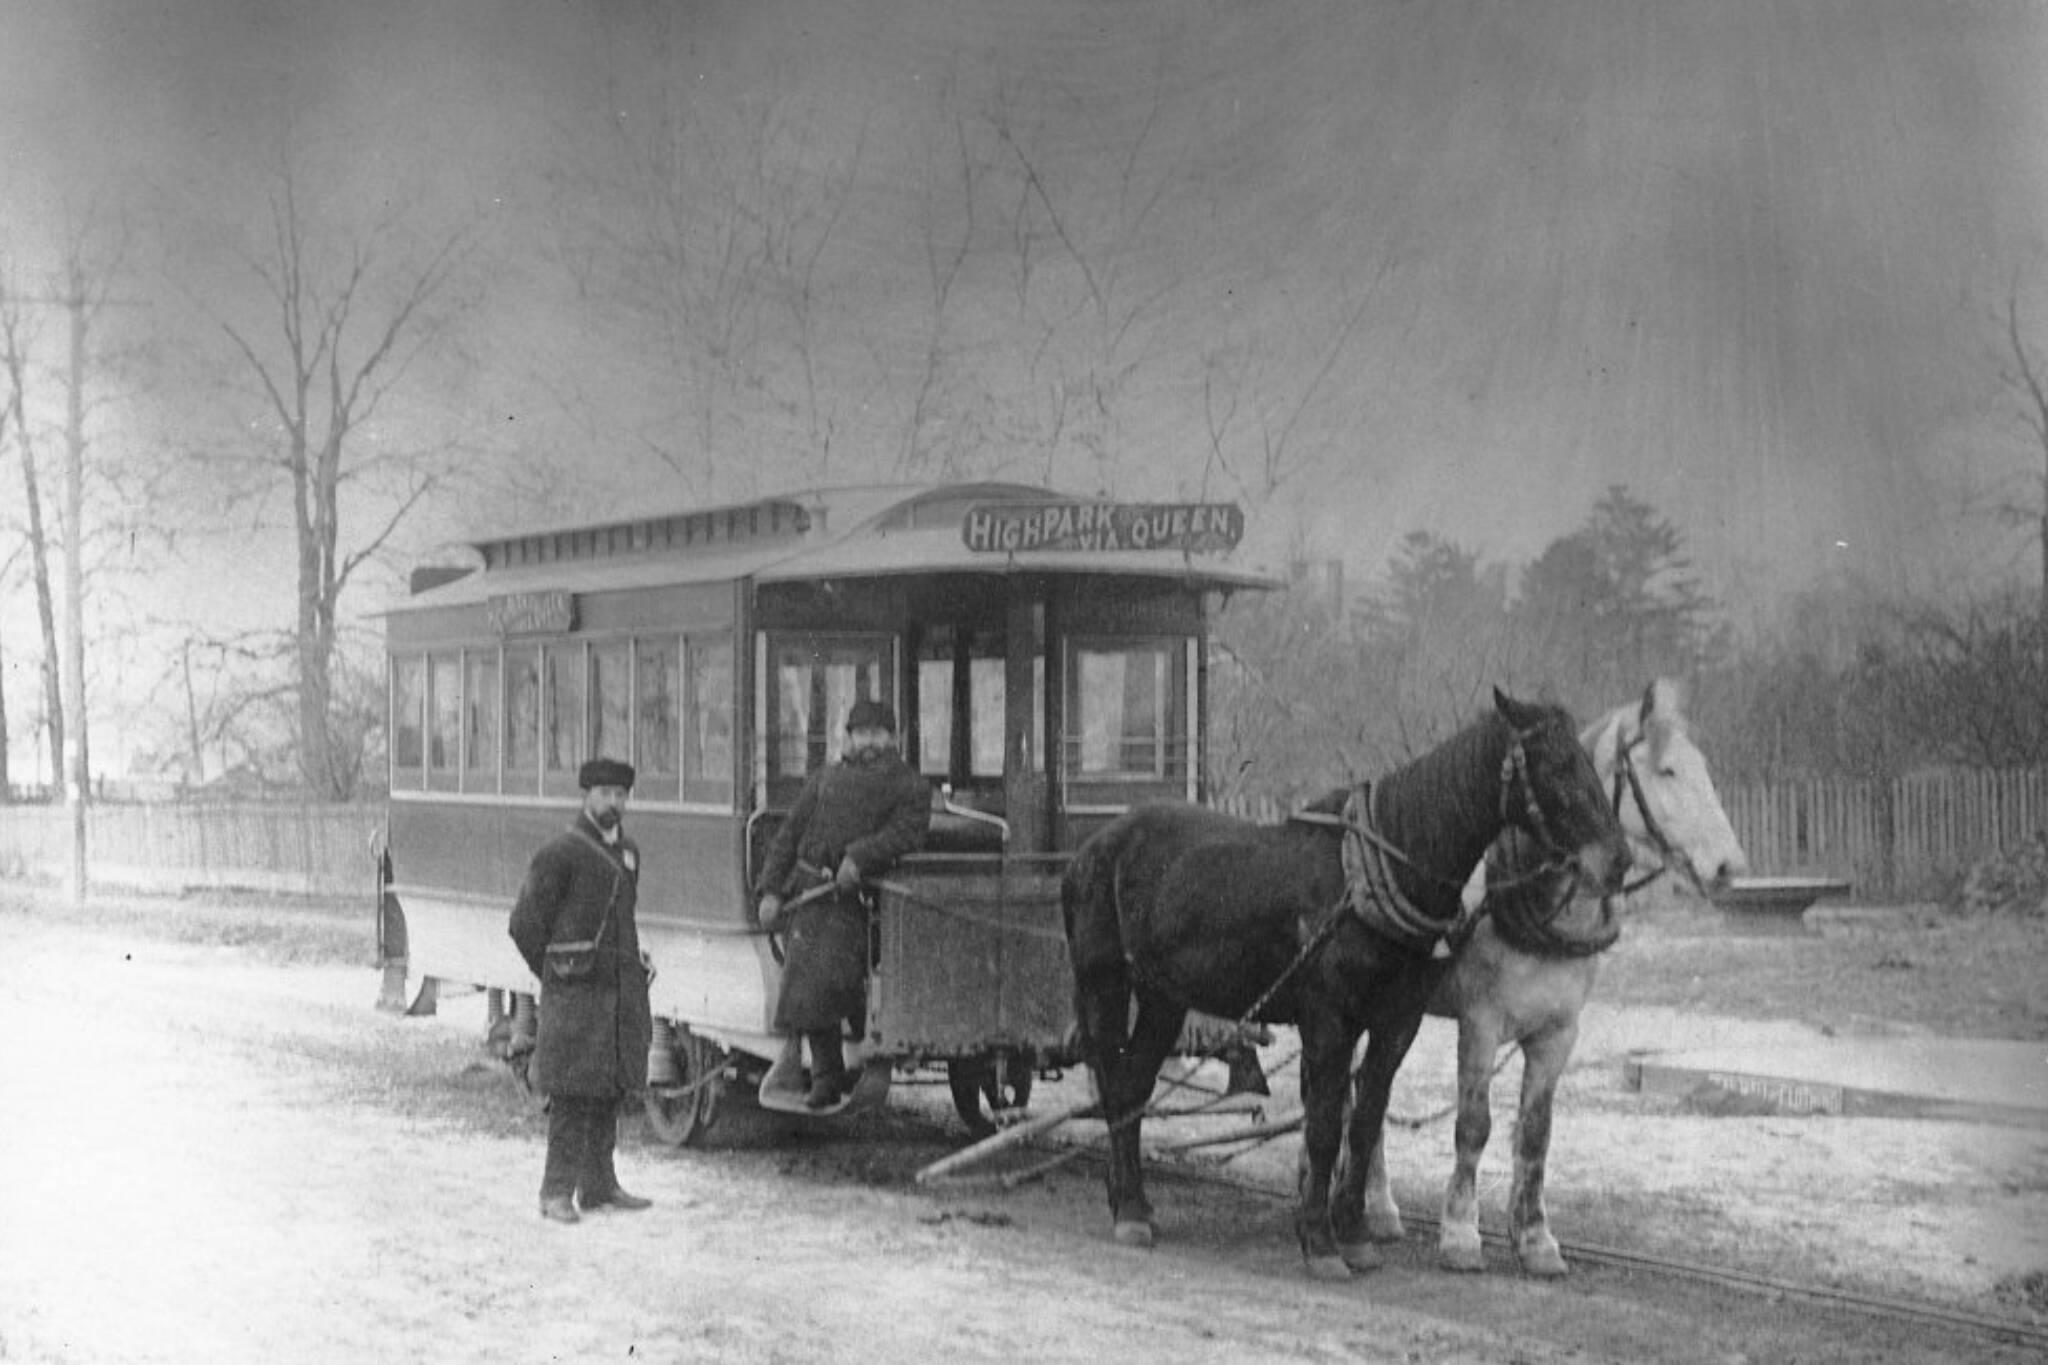 Toronto 1880s photos